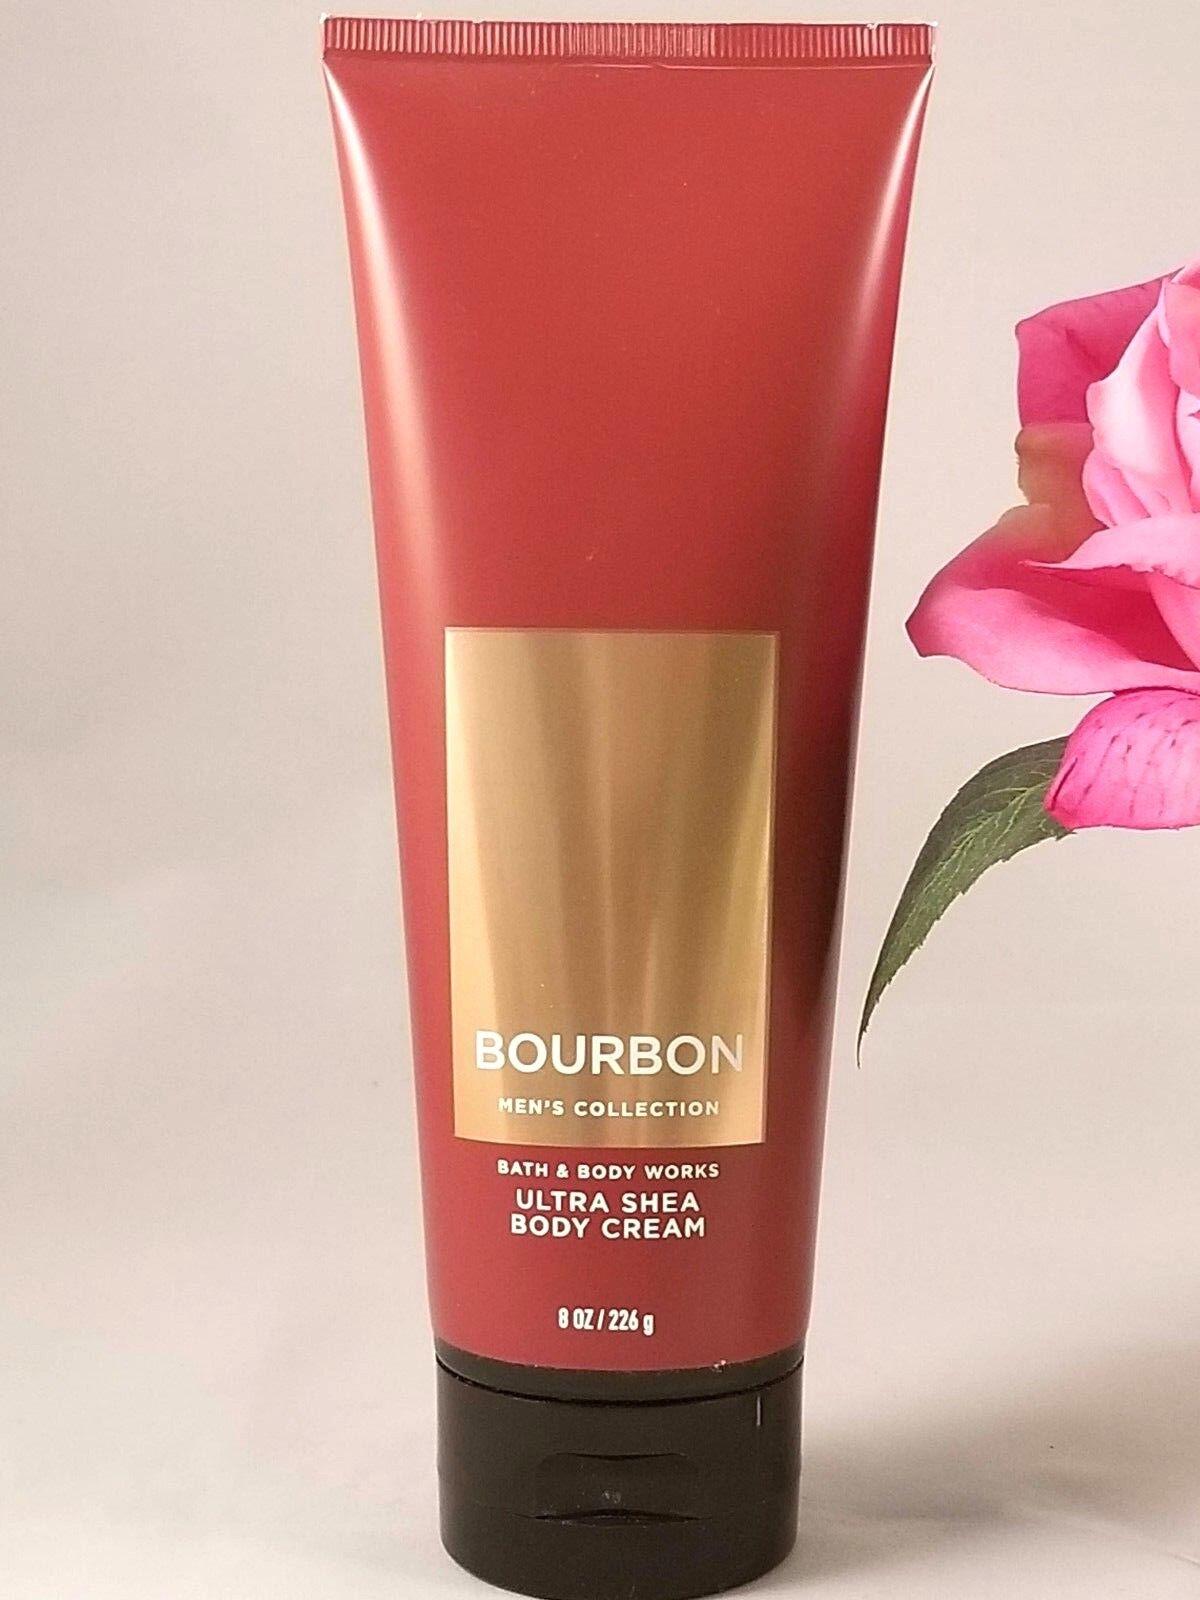 Bath & Body Works Bourbon Men's Ultra Shea Body Cream 8 oz